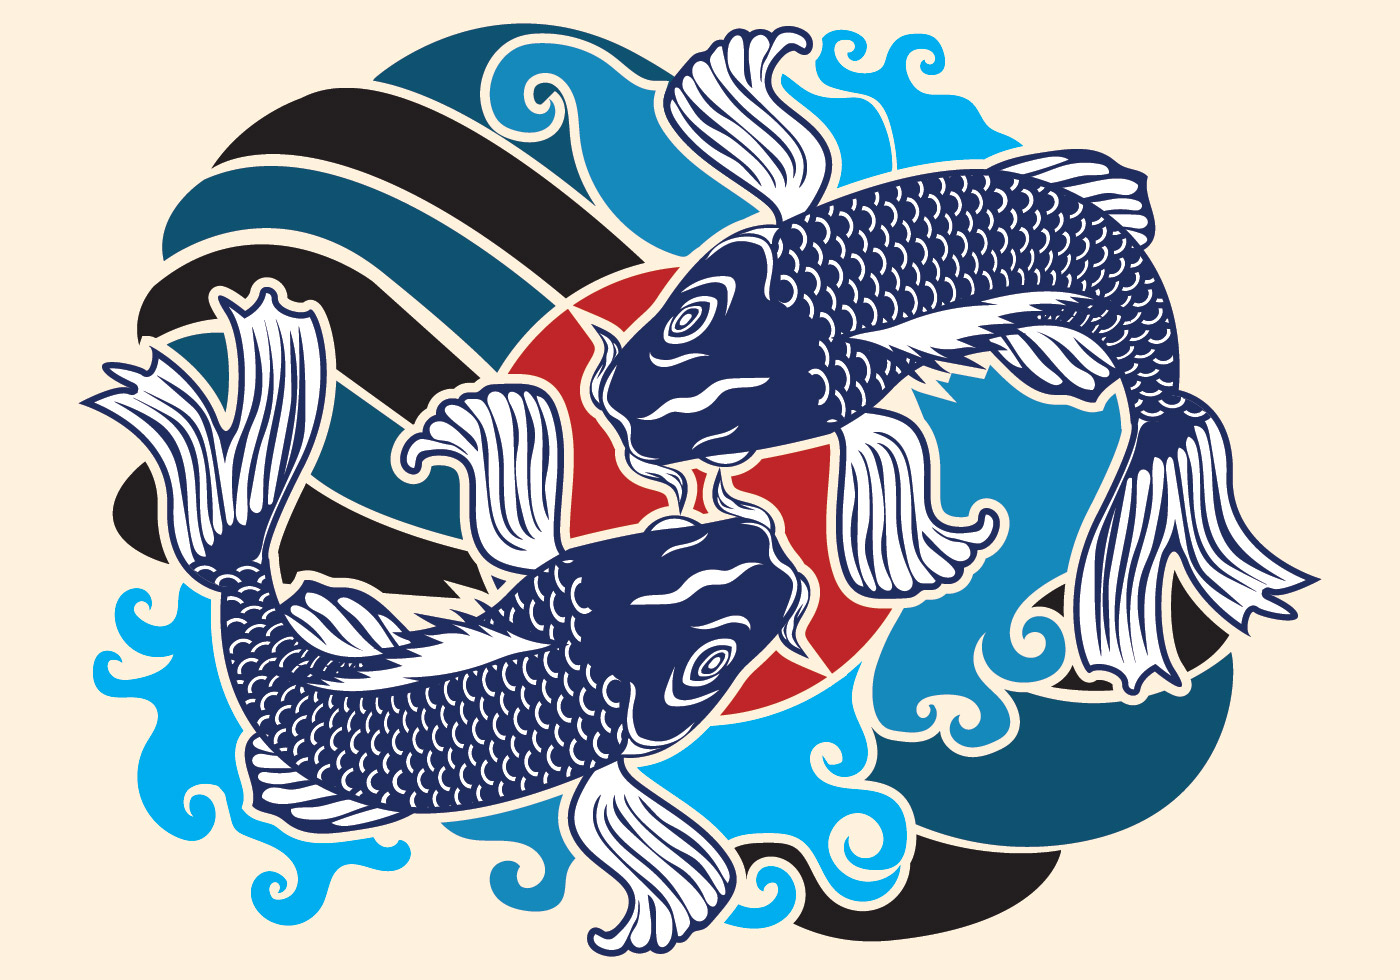 Japanese Wave Pattern Free Vector Art - (21940 Free Downloads)